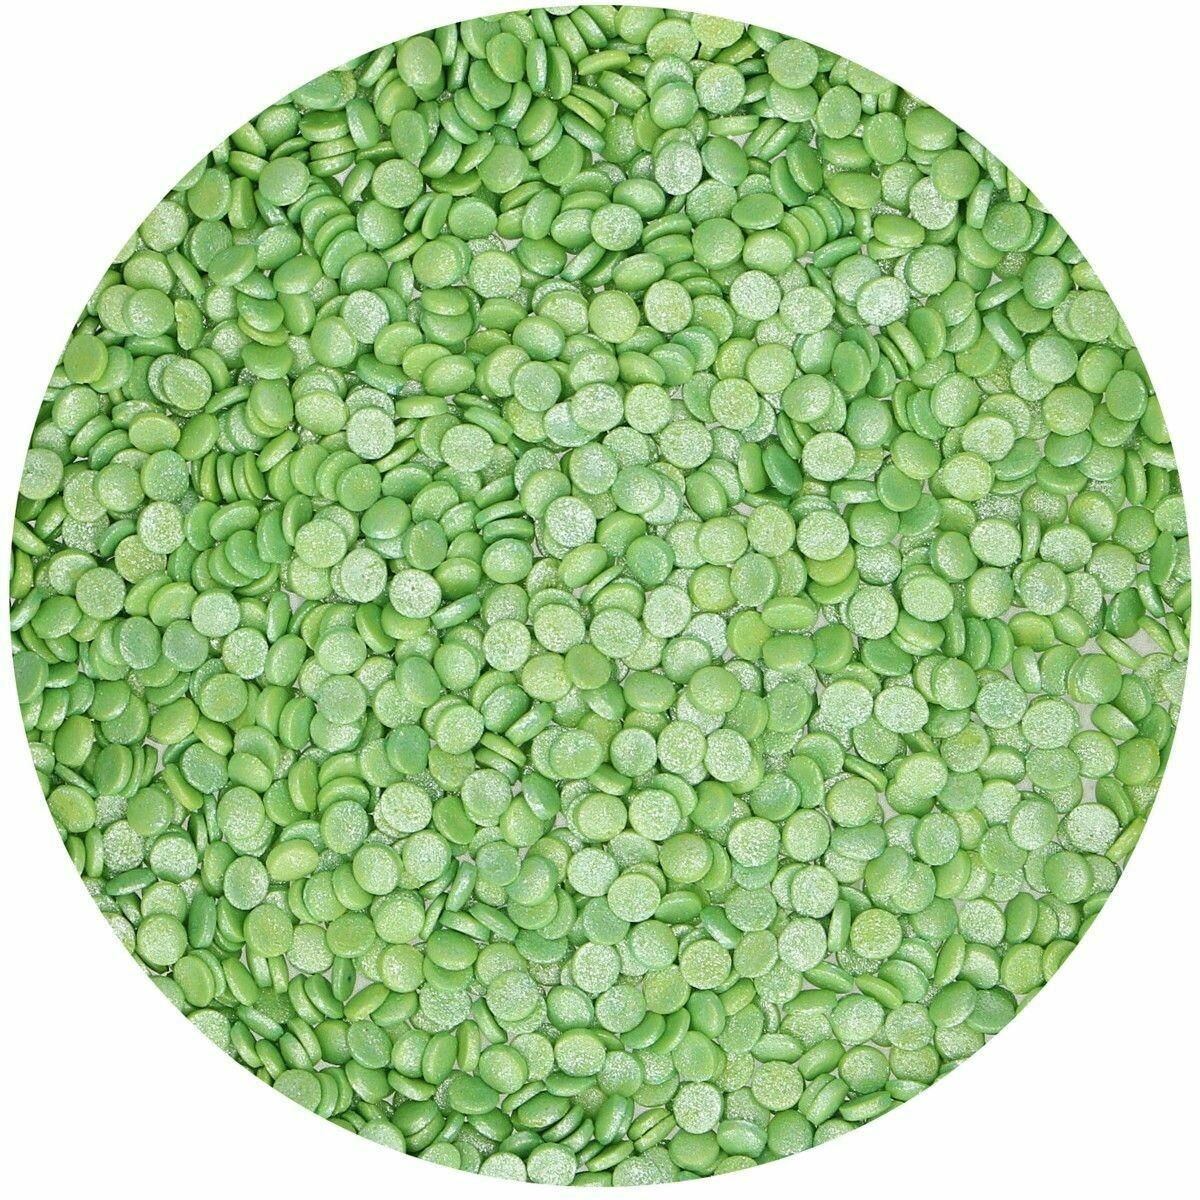 SALE!!! FunCakes Confetti Sprinkles -MINI METALLIC GREEN -Κονφετί Πράσινο Μεταλιζέ 70γρ-ΑΝΑΛΩΣΗ ΚΑΤΑ ΠΡΟΤΙΜΗΣΗ 12/2020